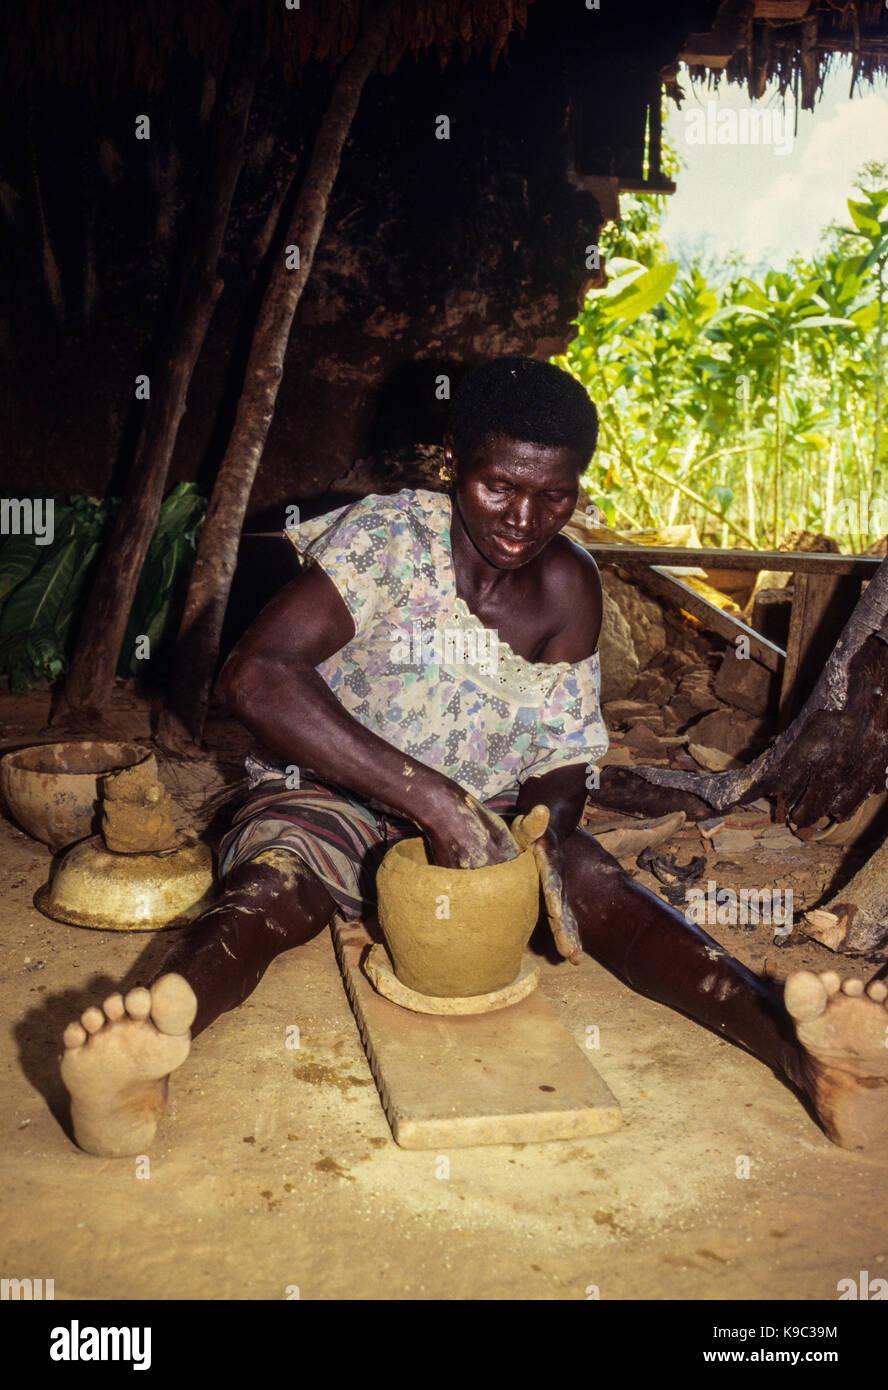 Tabakala, Ivory Coast, Cote d'Ivoire.  Senoufo Woman Making a Clay Pot. - Stock Image